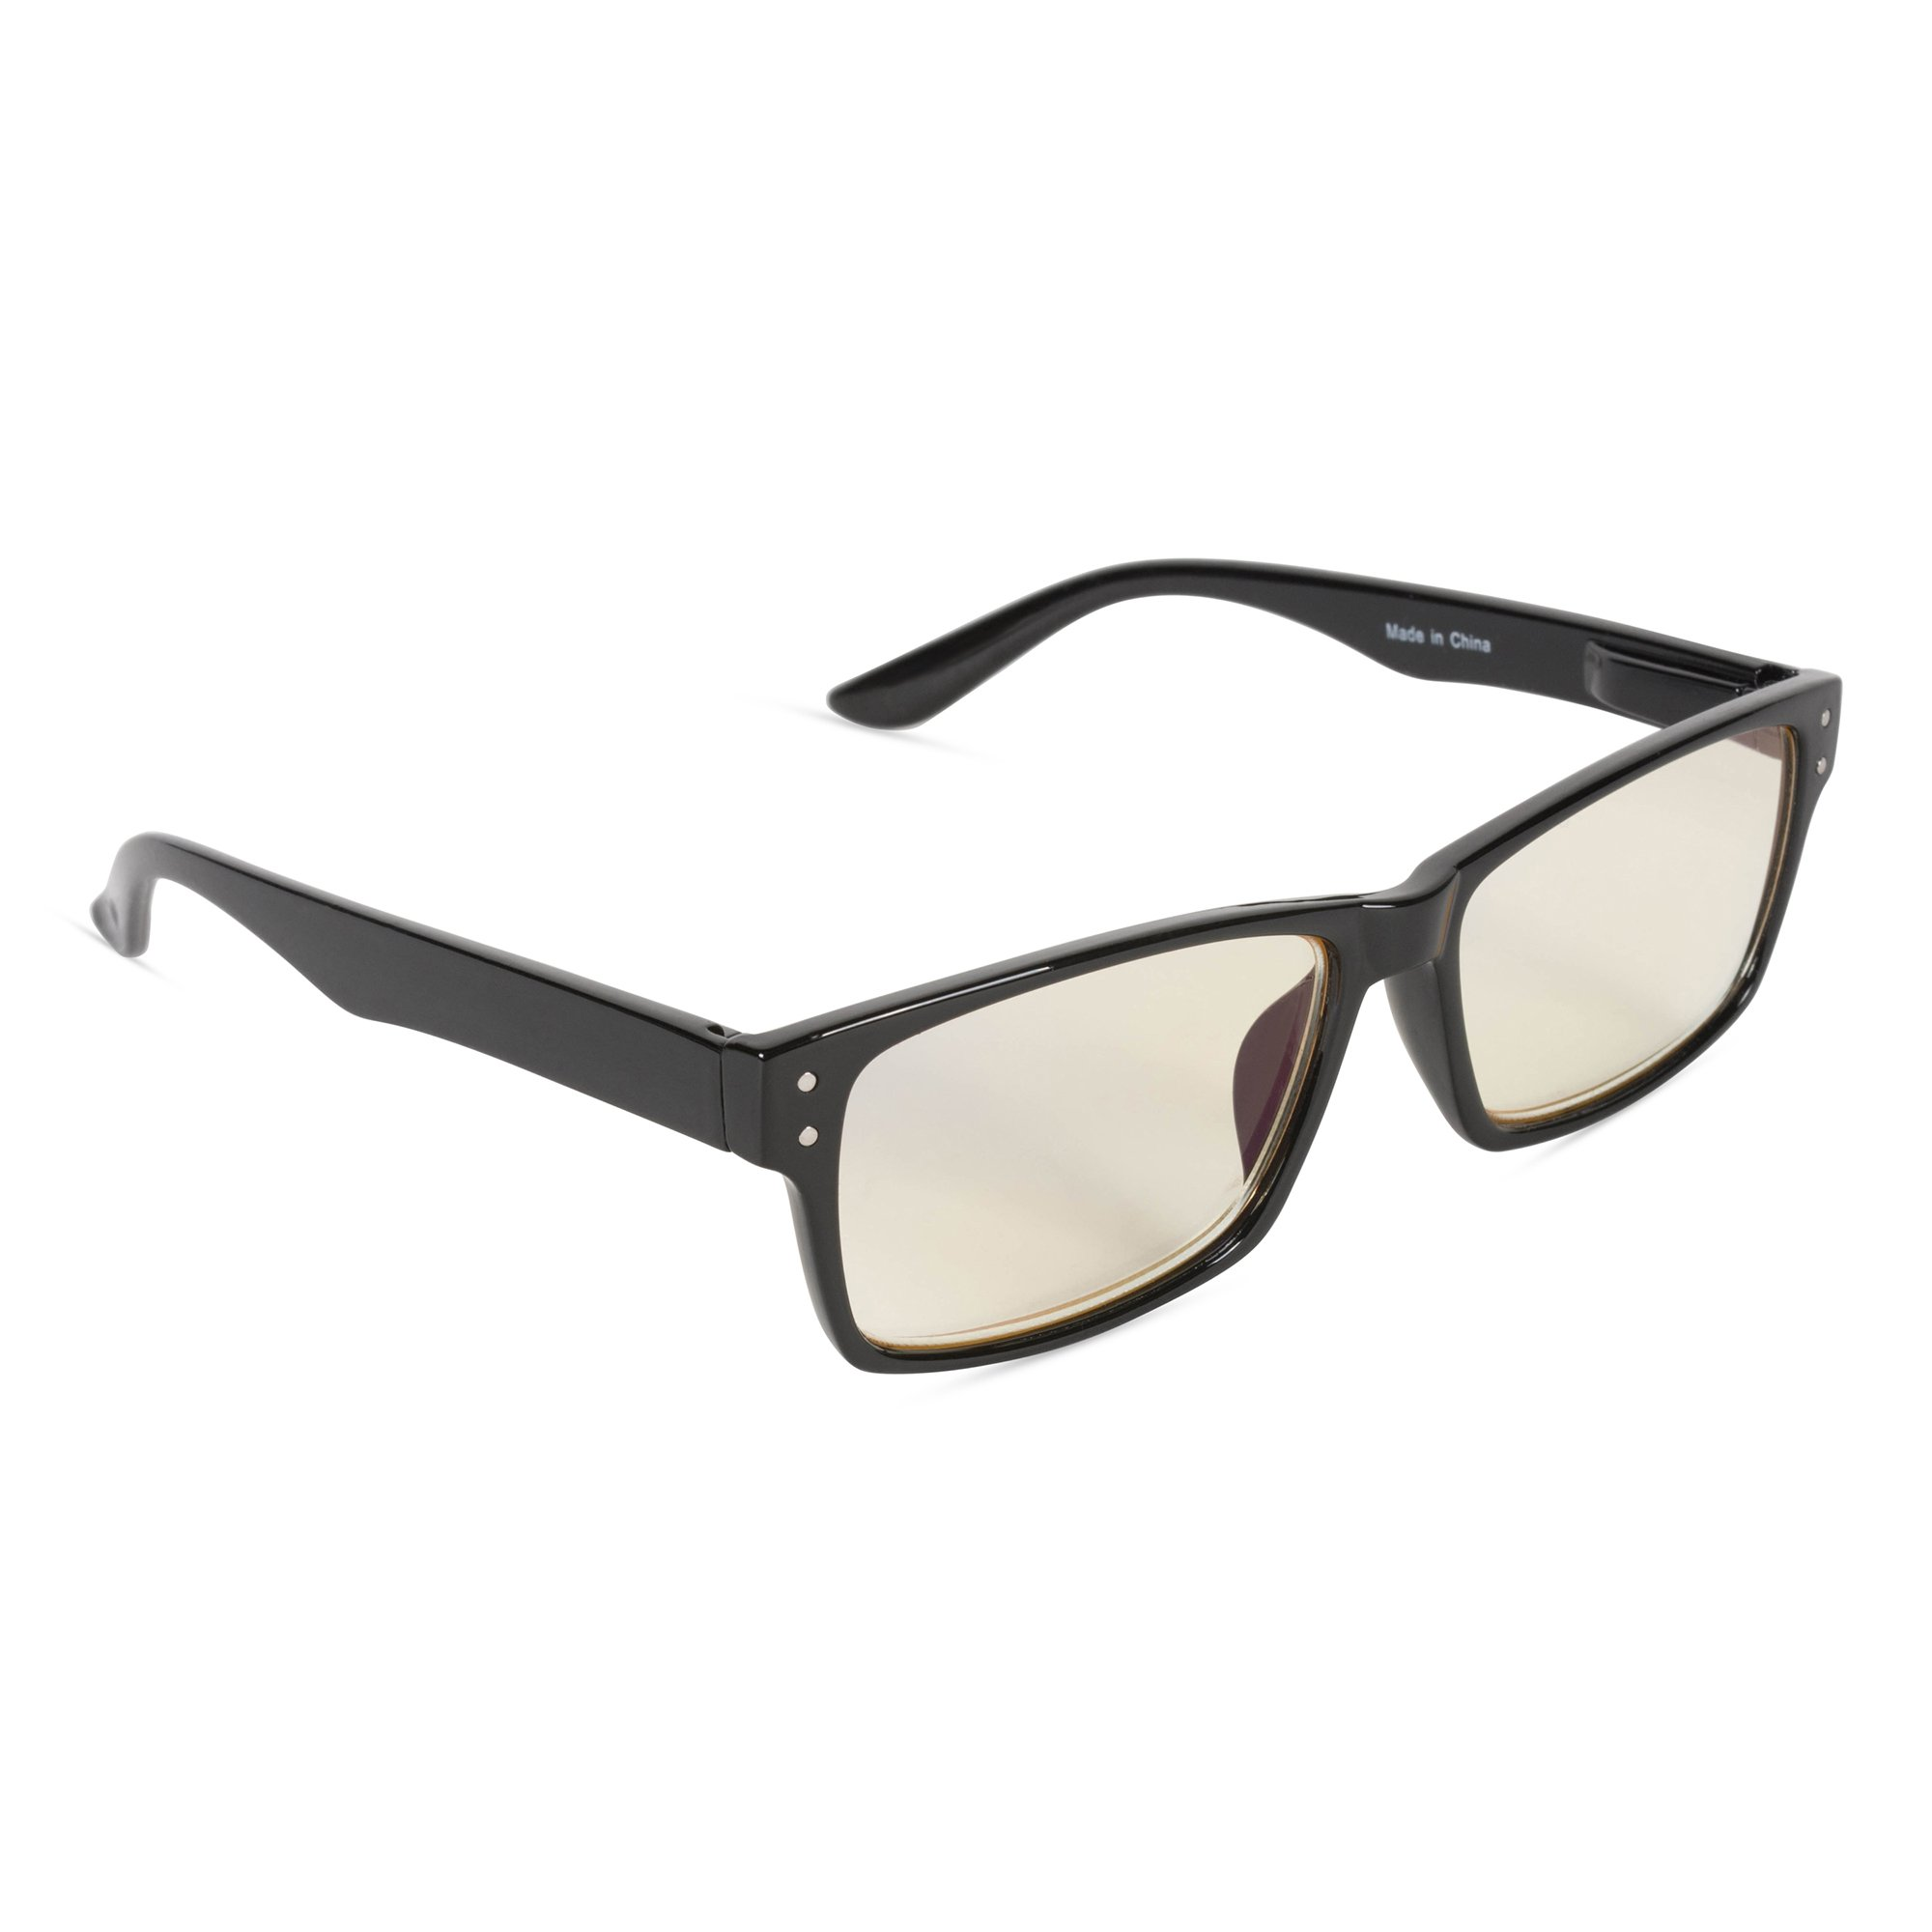 6f7ea84e392 Inner Vision Eye Strain Relief Computer Screen Glasses w Case - Anti Blue  Light